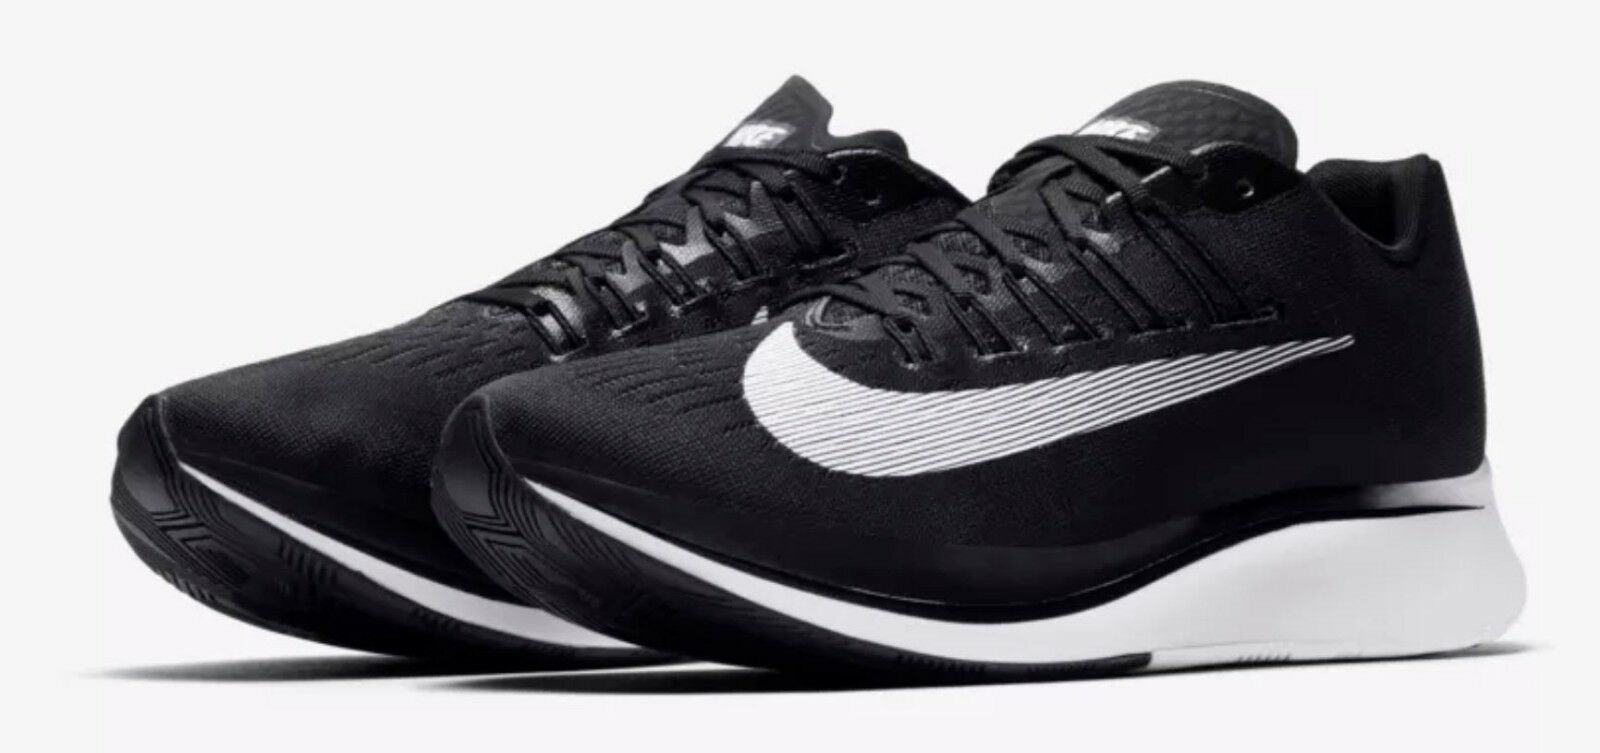 Nike Uomo Dimensione 8.5 Zoom Zoom Zoom Fly Running scarpe nero bianca Anthracite 880848 001 New 5d06eb